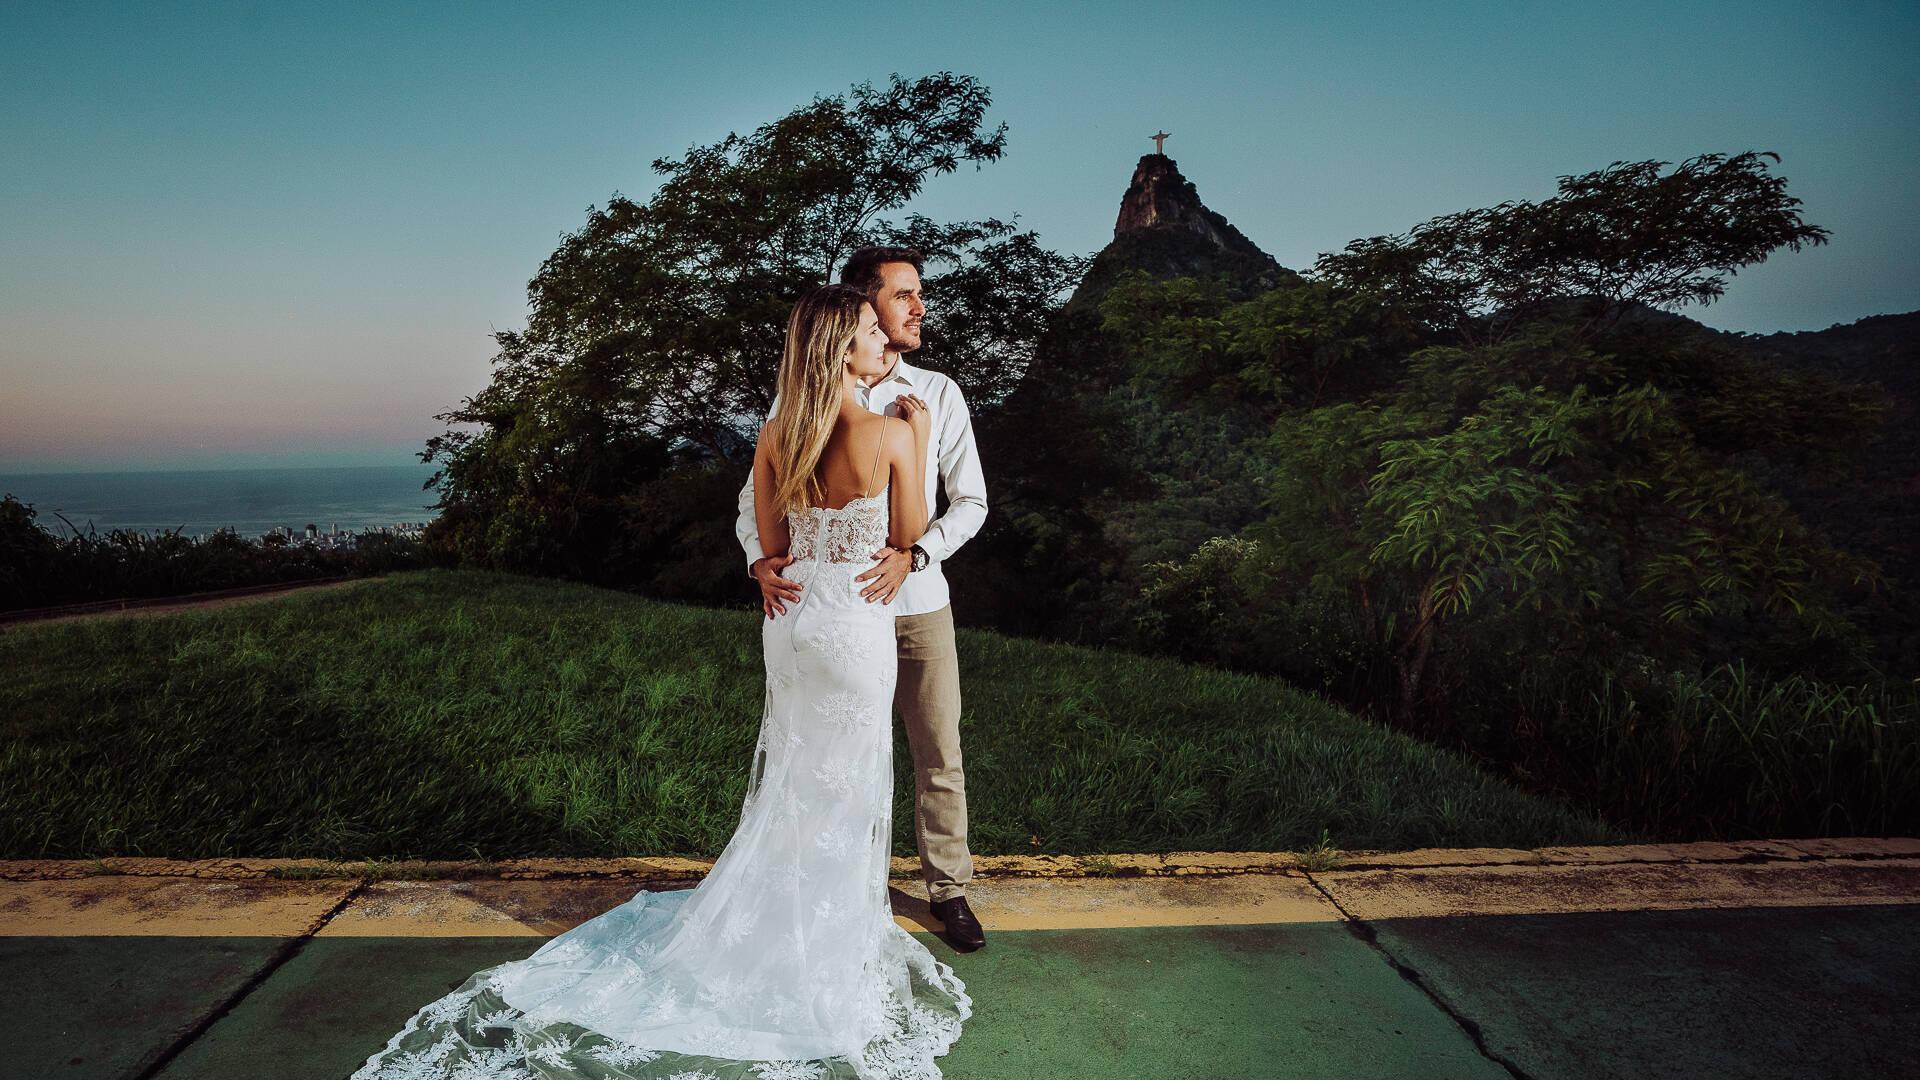 Ensaio Pré-Wedding de Régis e Camile